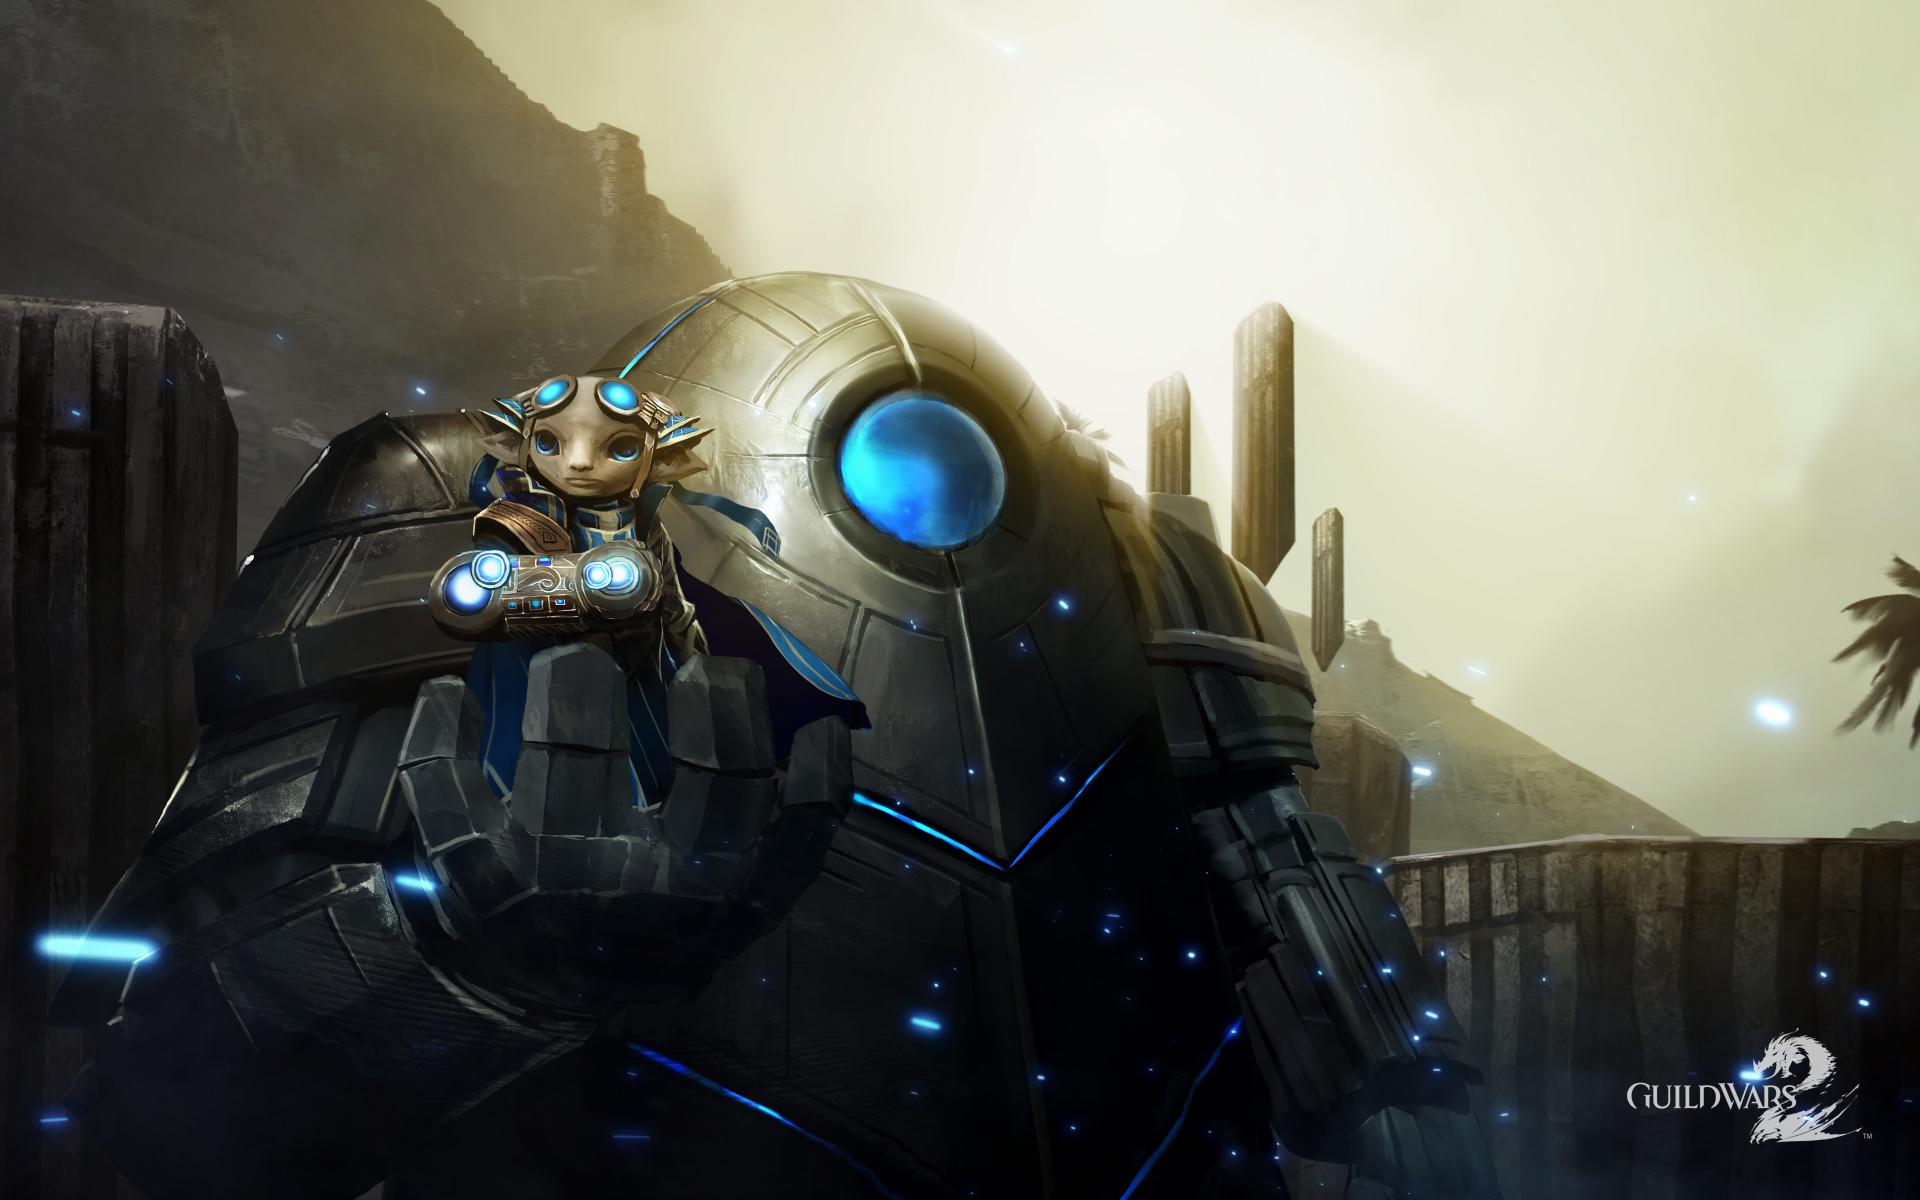 GW2Spidy | Guild Wars 2 Tradingpost Graphs